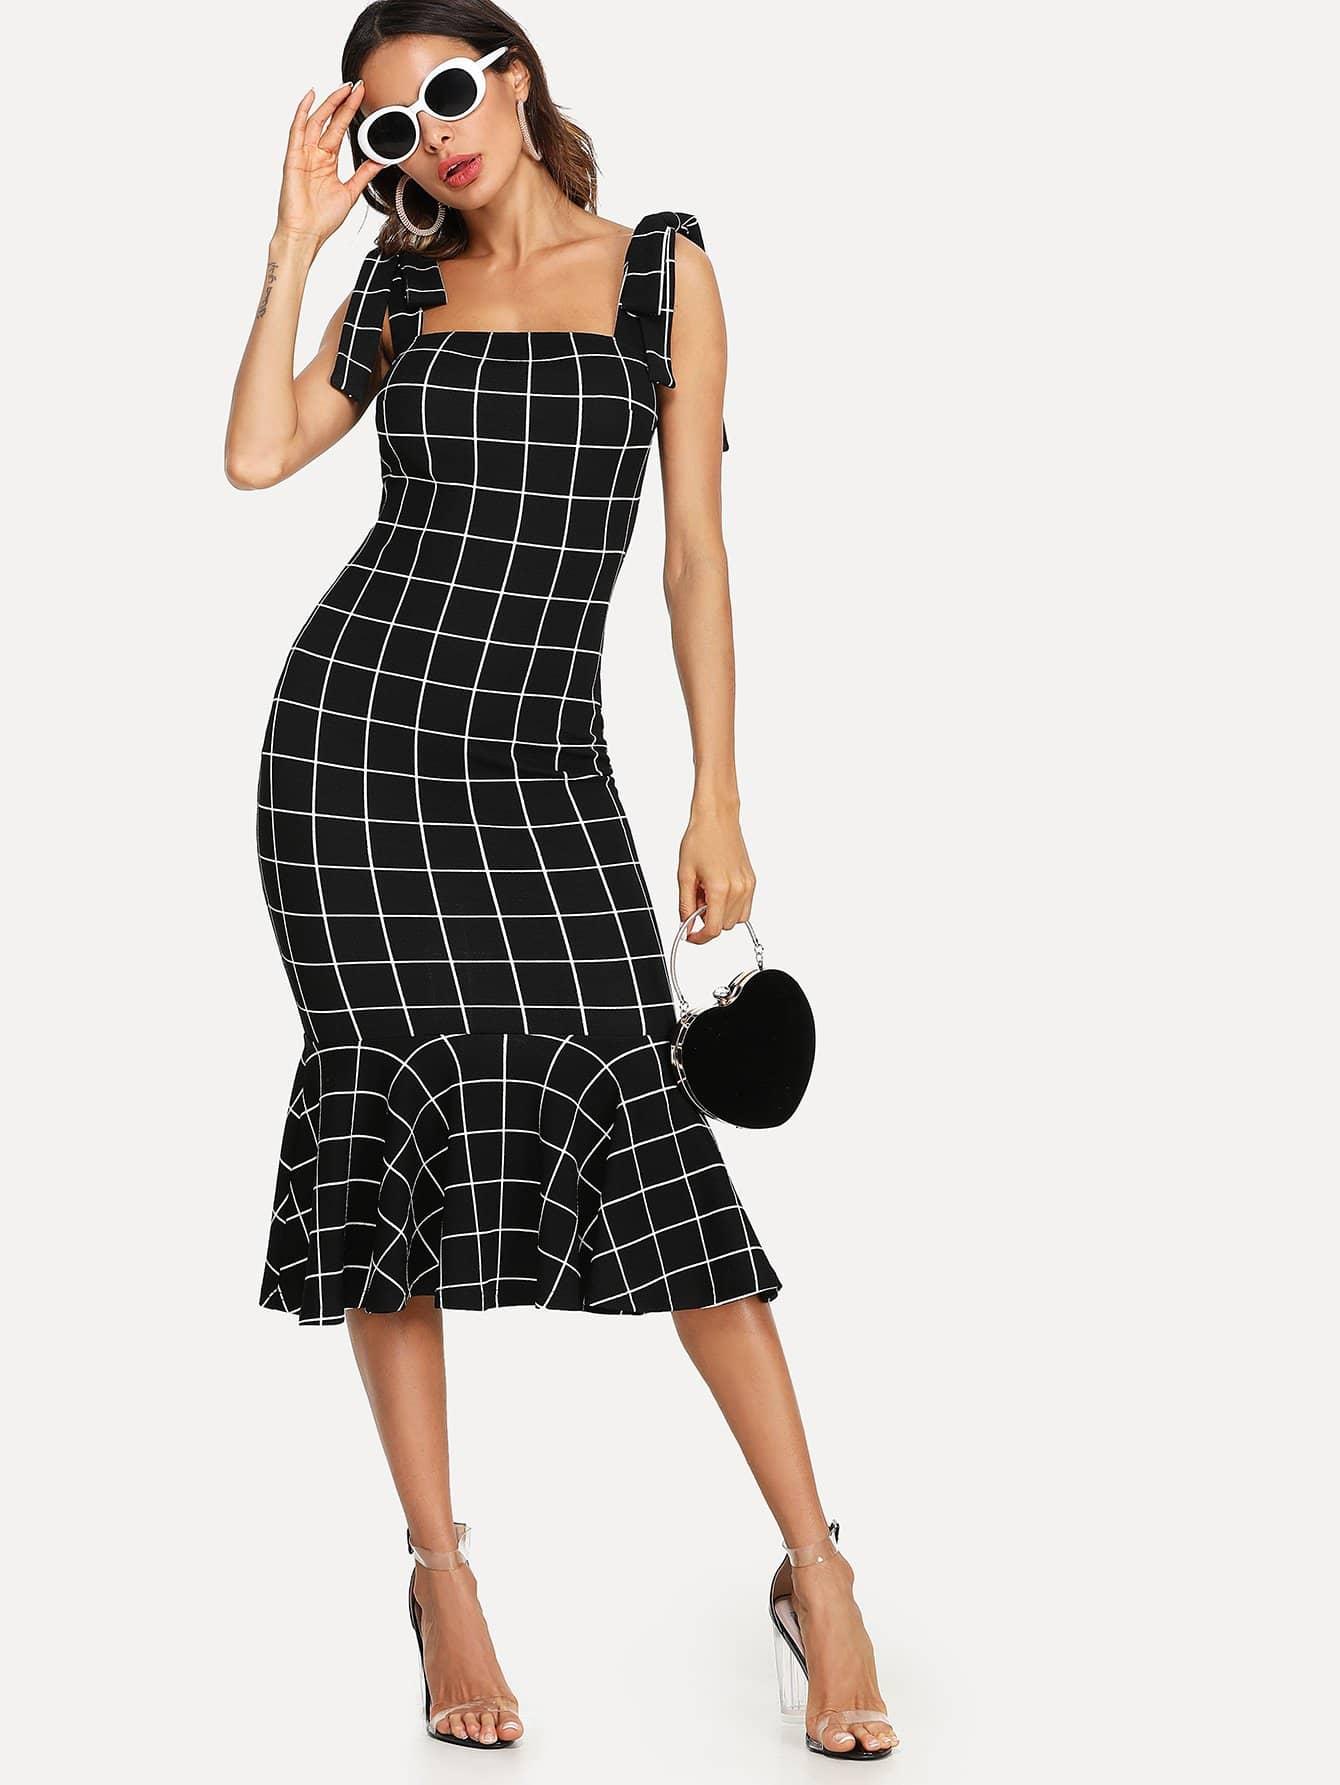 Ruffle Hem Grid Dress With Tied Strap wrap front tied v back ruffle hem dress